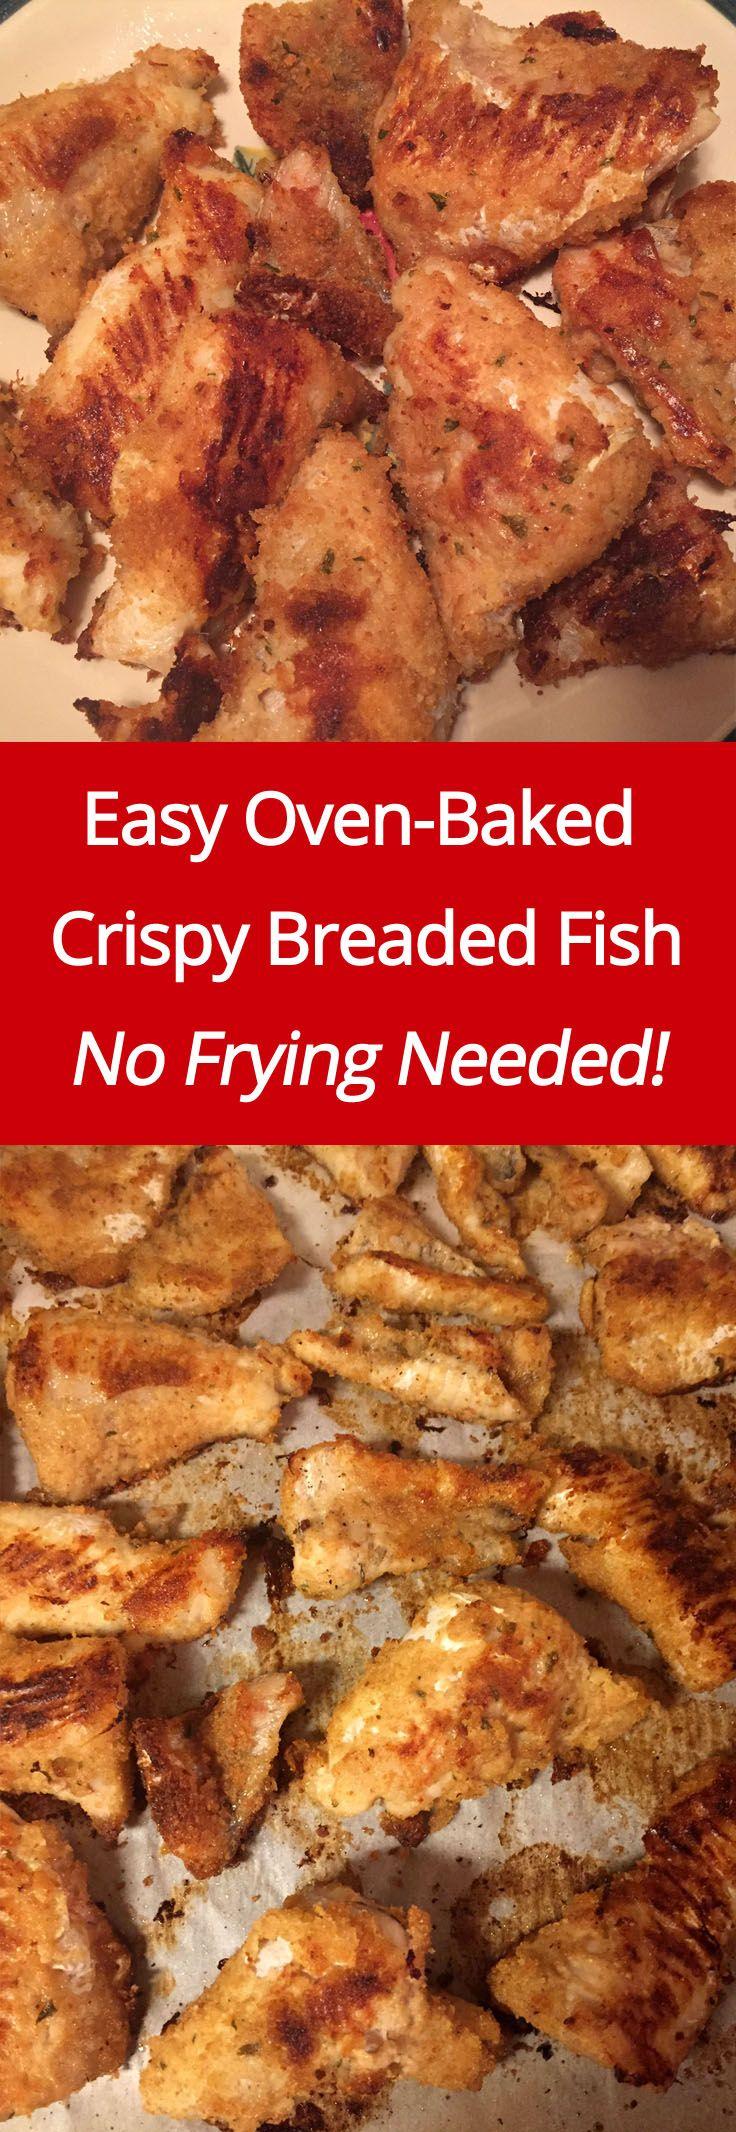 Easy Oven Baked Crispy Breaded Fish Recipe | MelanieCooks.com